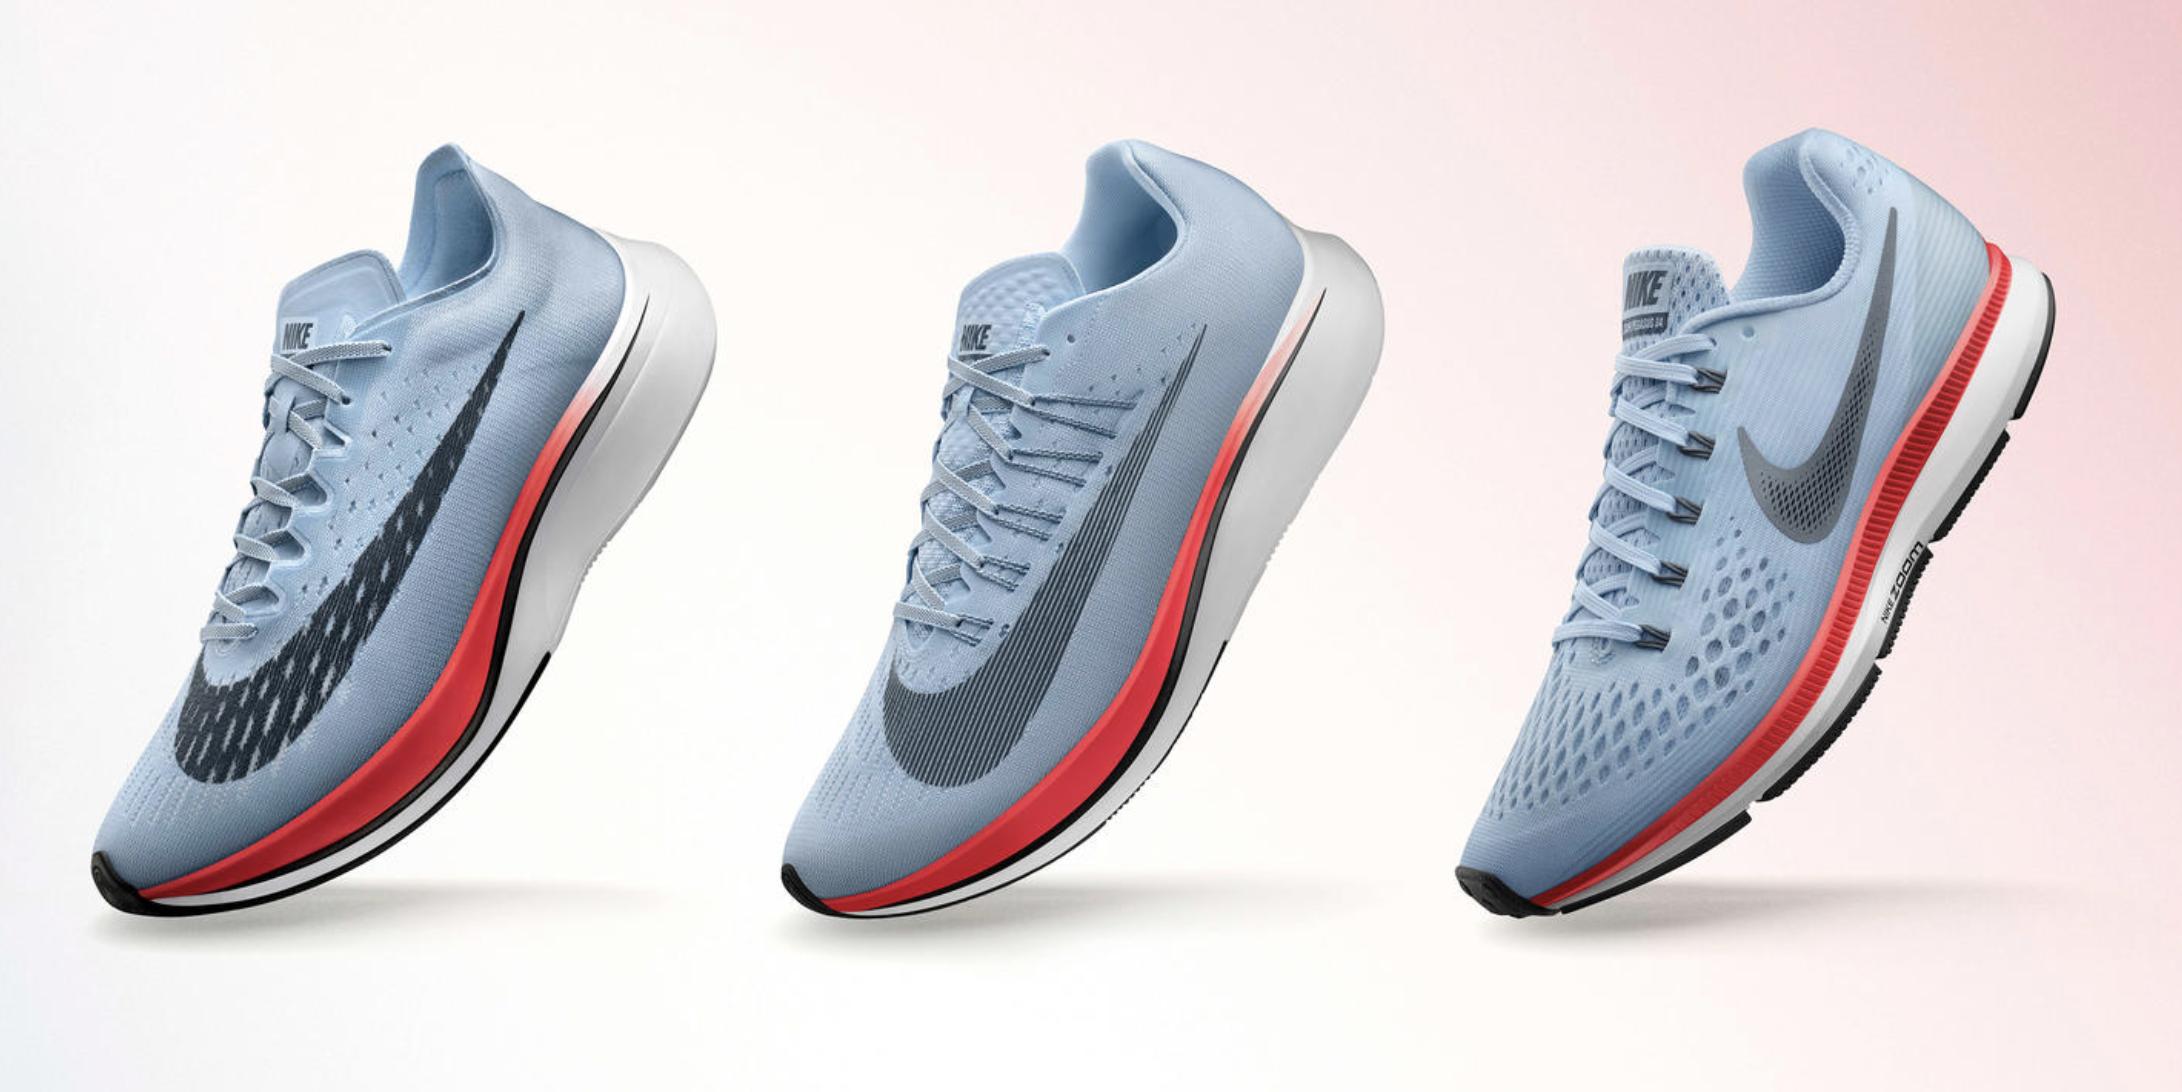 Nike's new Zoom Vaporfly running shoe